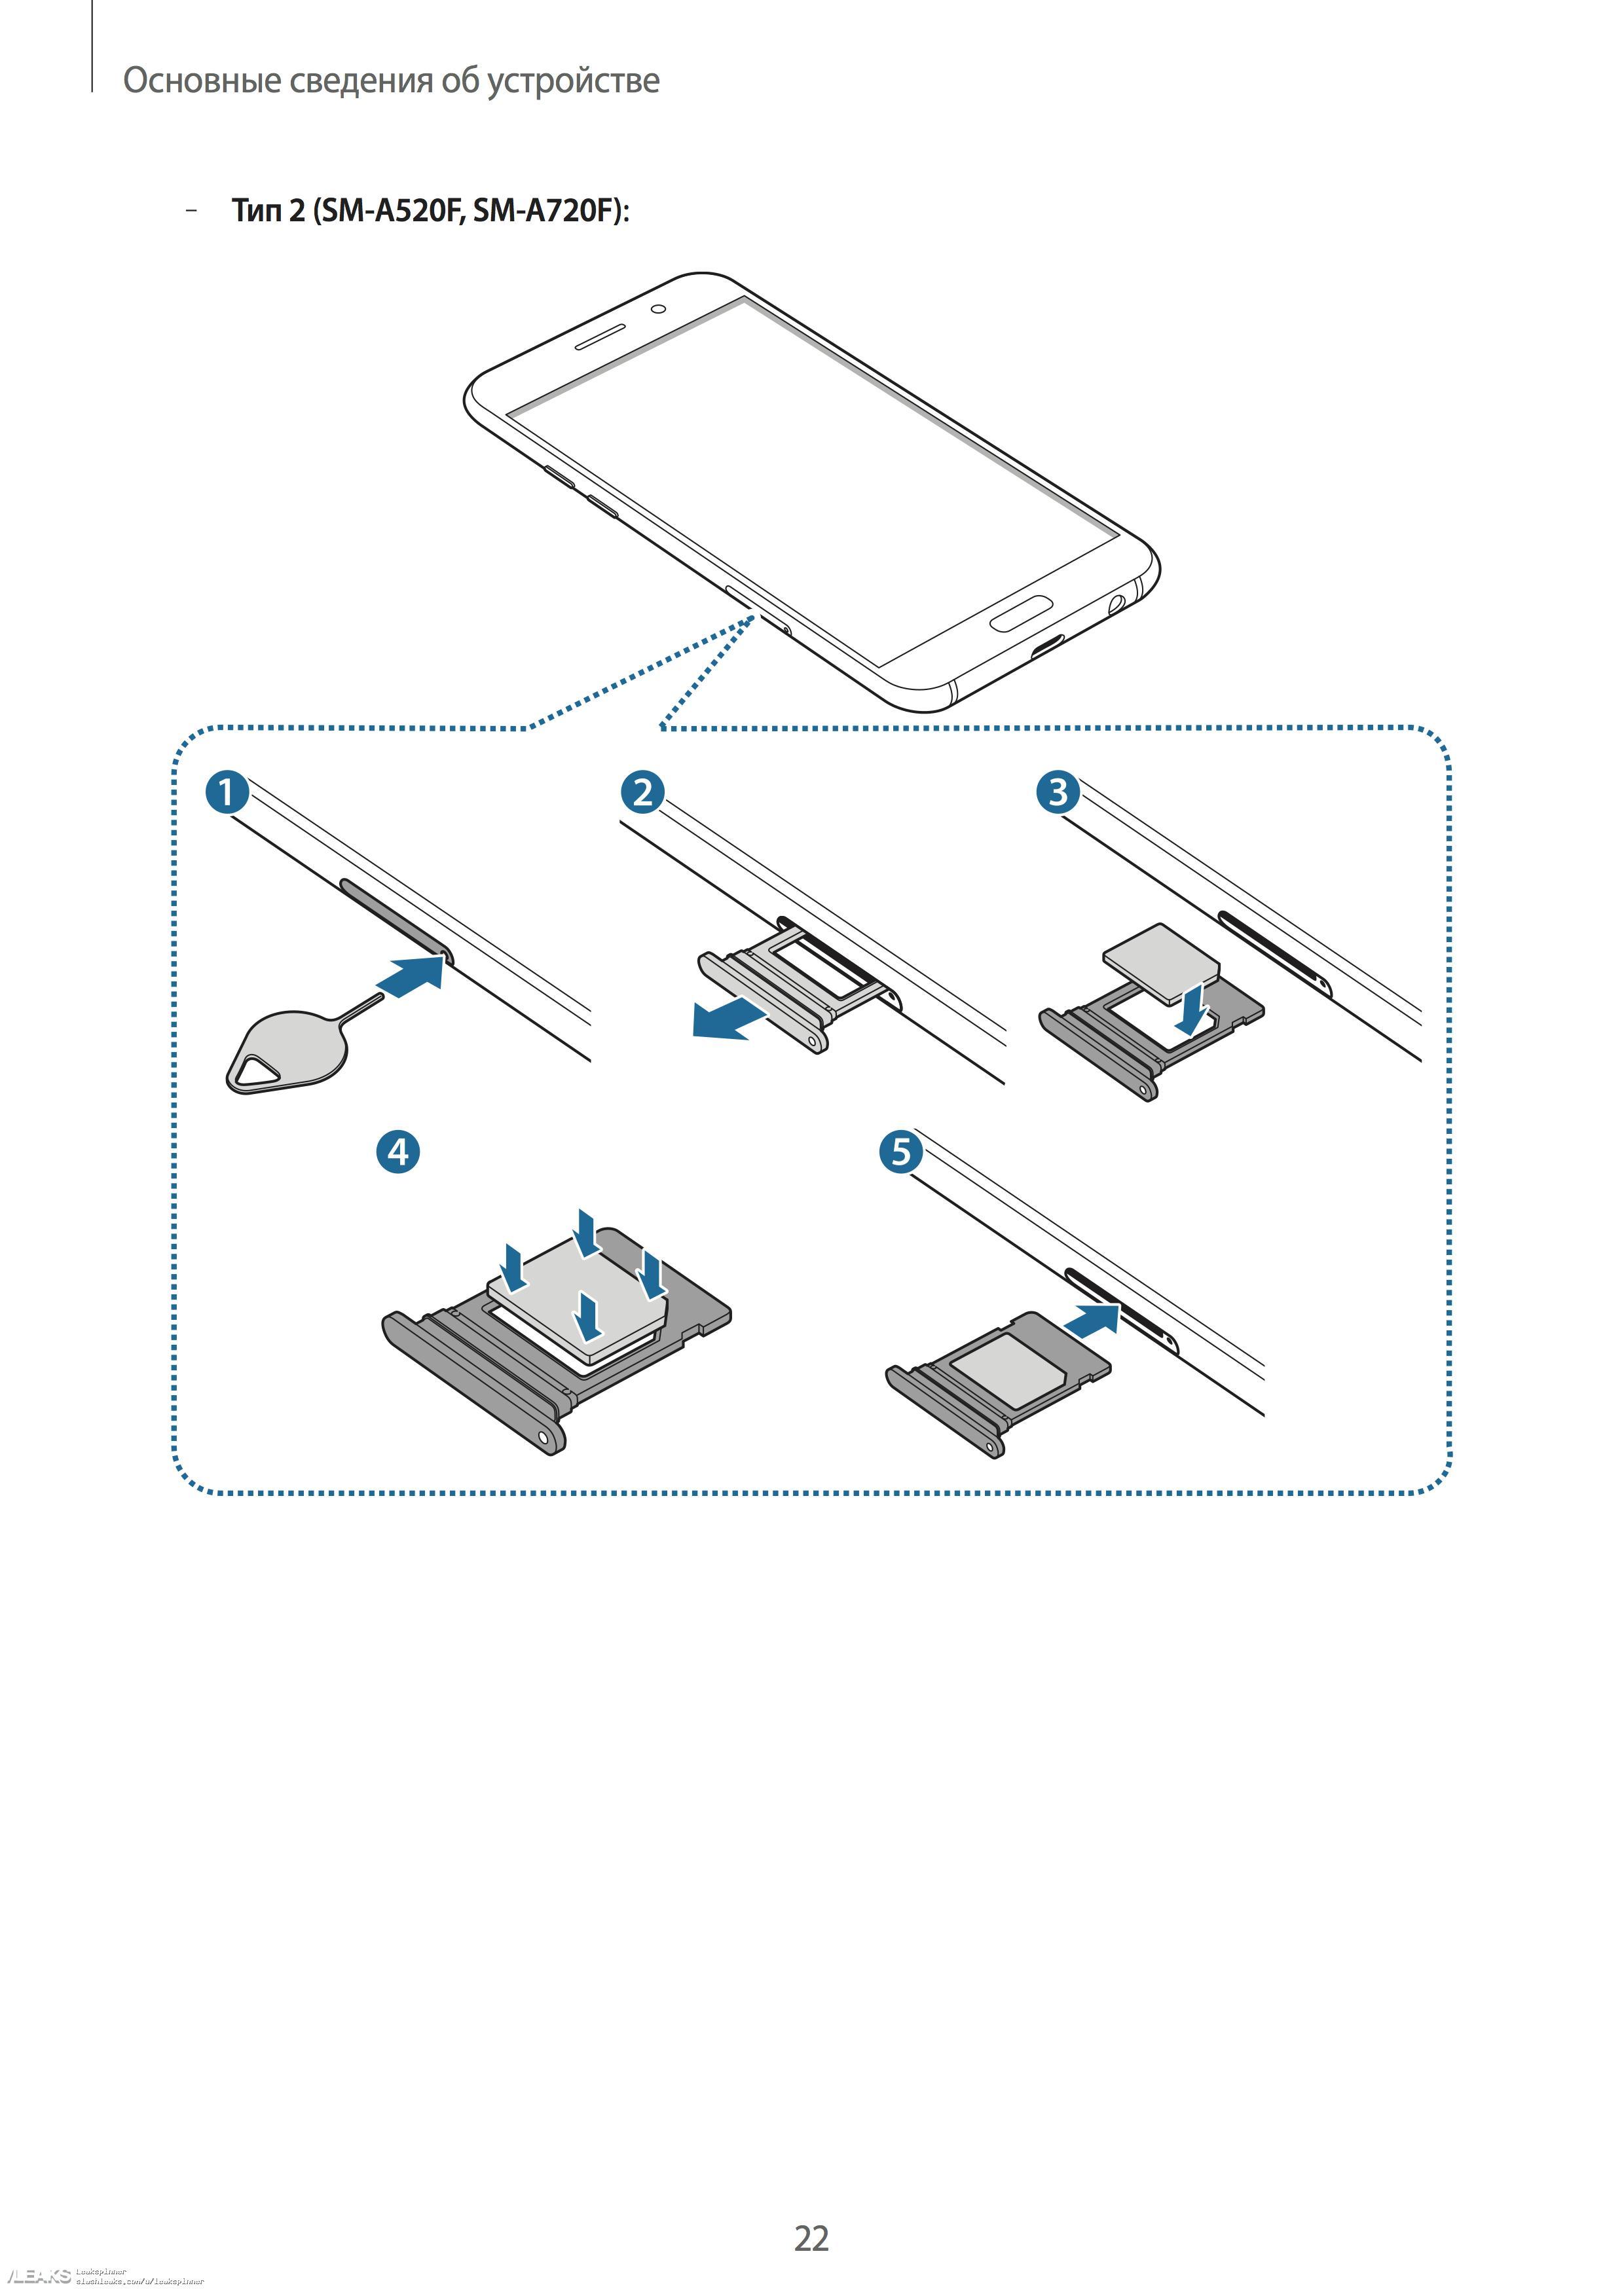 Galaxy A3, Galaxy A5 and Galaxy A7 (2017) user guide